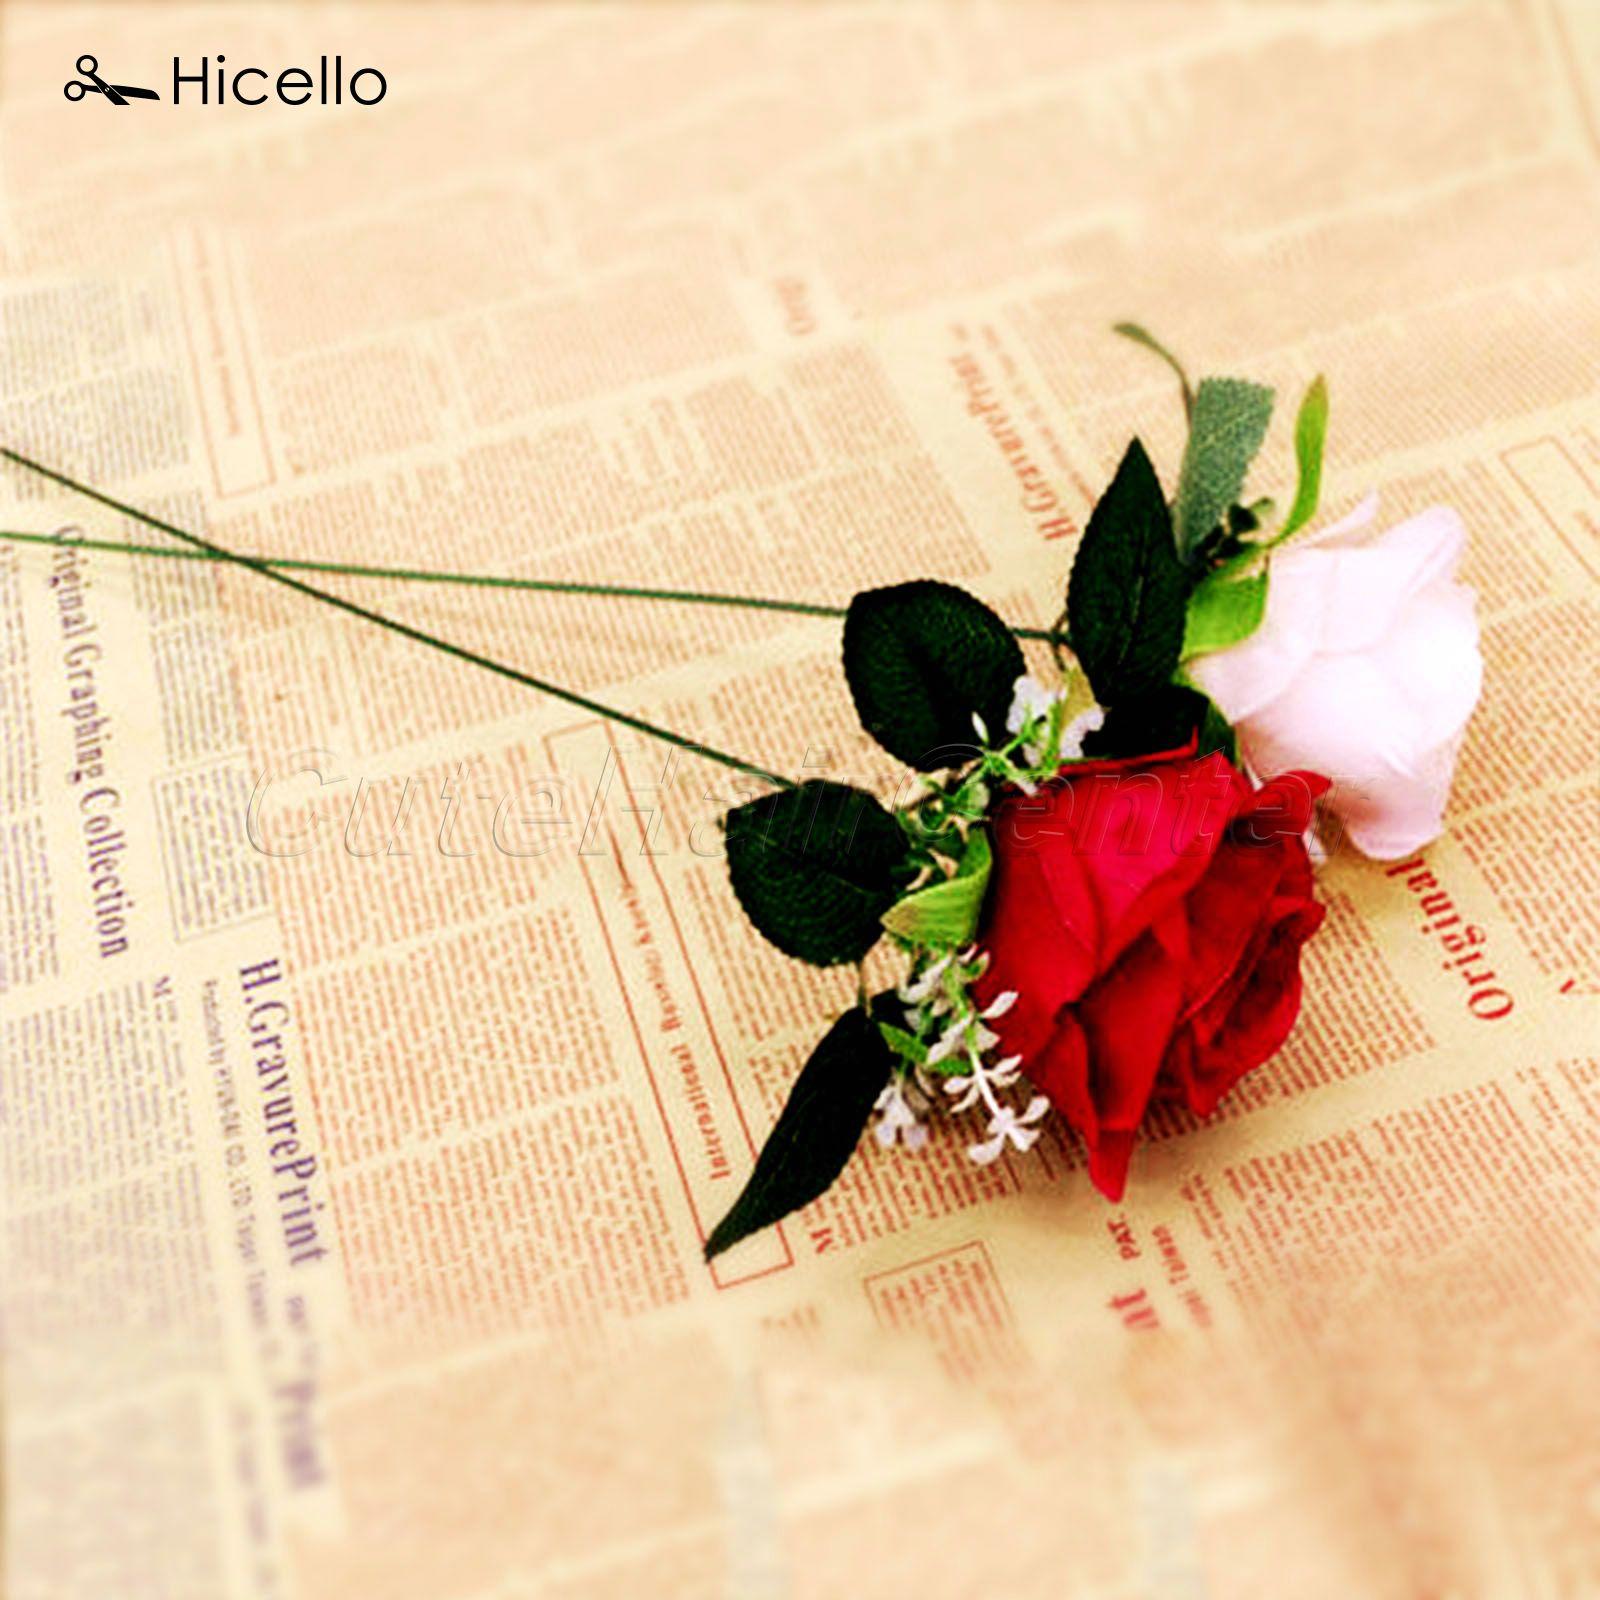 10 Pcs lot Flower Stub Hicello Batang Kertas plastik Hijau Floral Pita Besi Kawat  Bunga Buatan Batang Stub Craft Dekorasi 60 cm di Buatan   Bunga Kering ... 1d990d5880